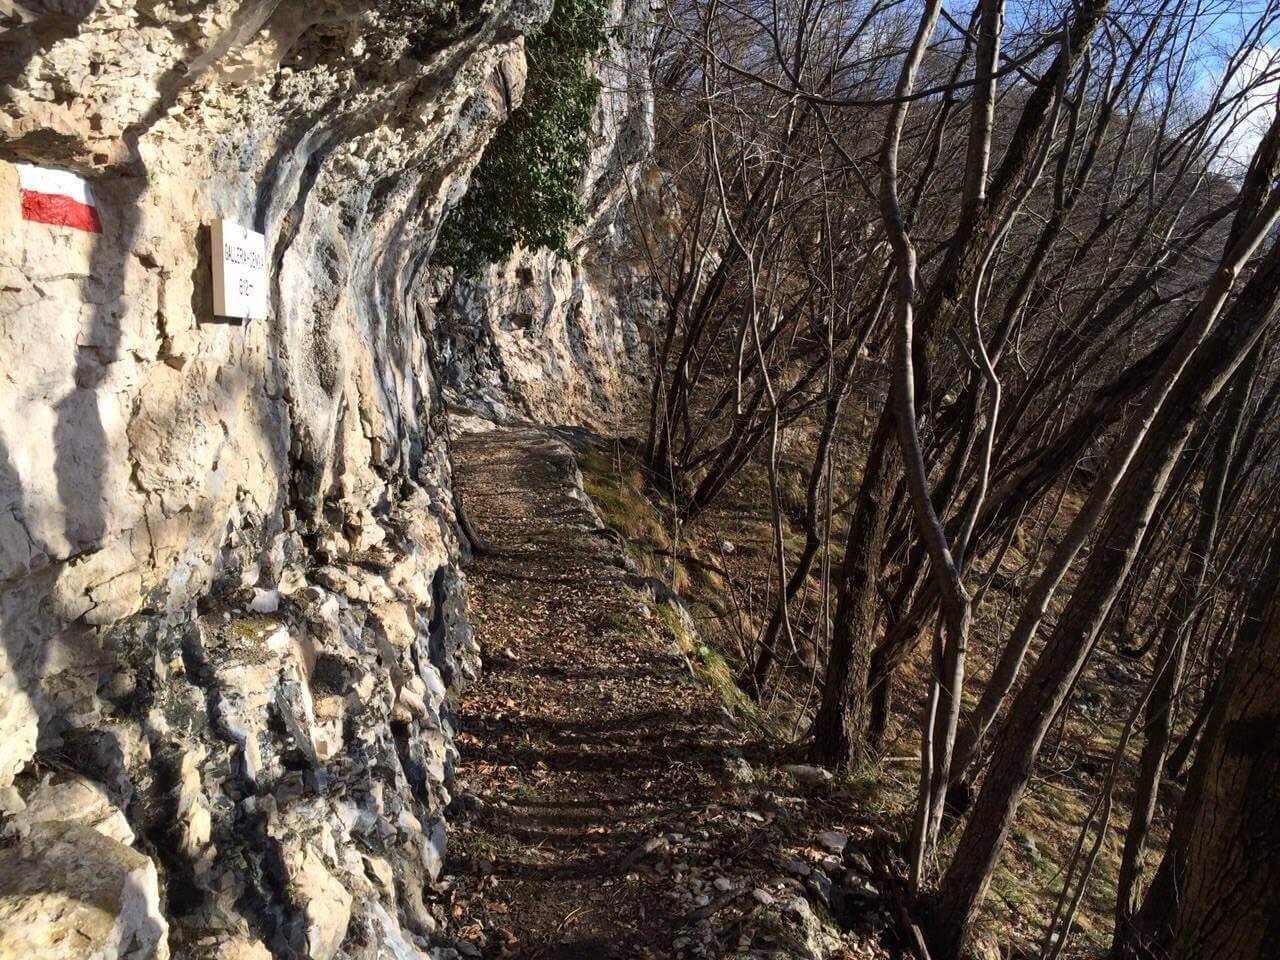 Sentiero Pierino Zuanna cengia galleria